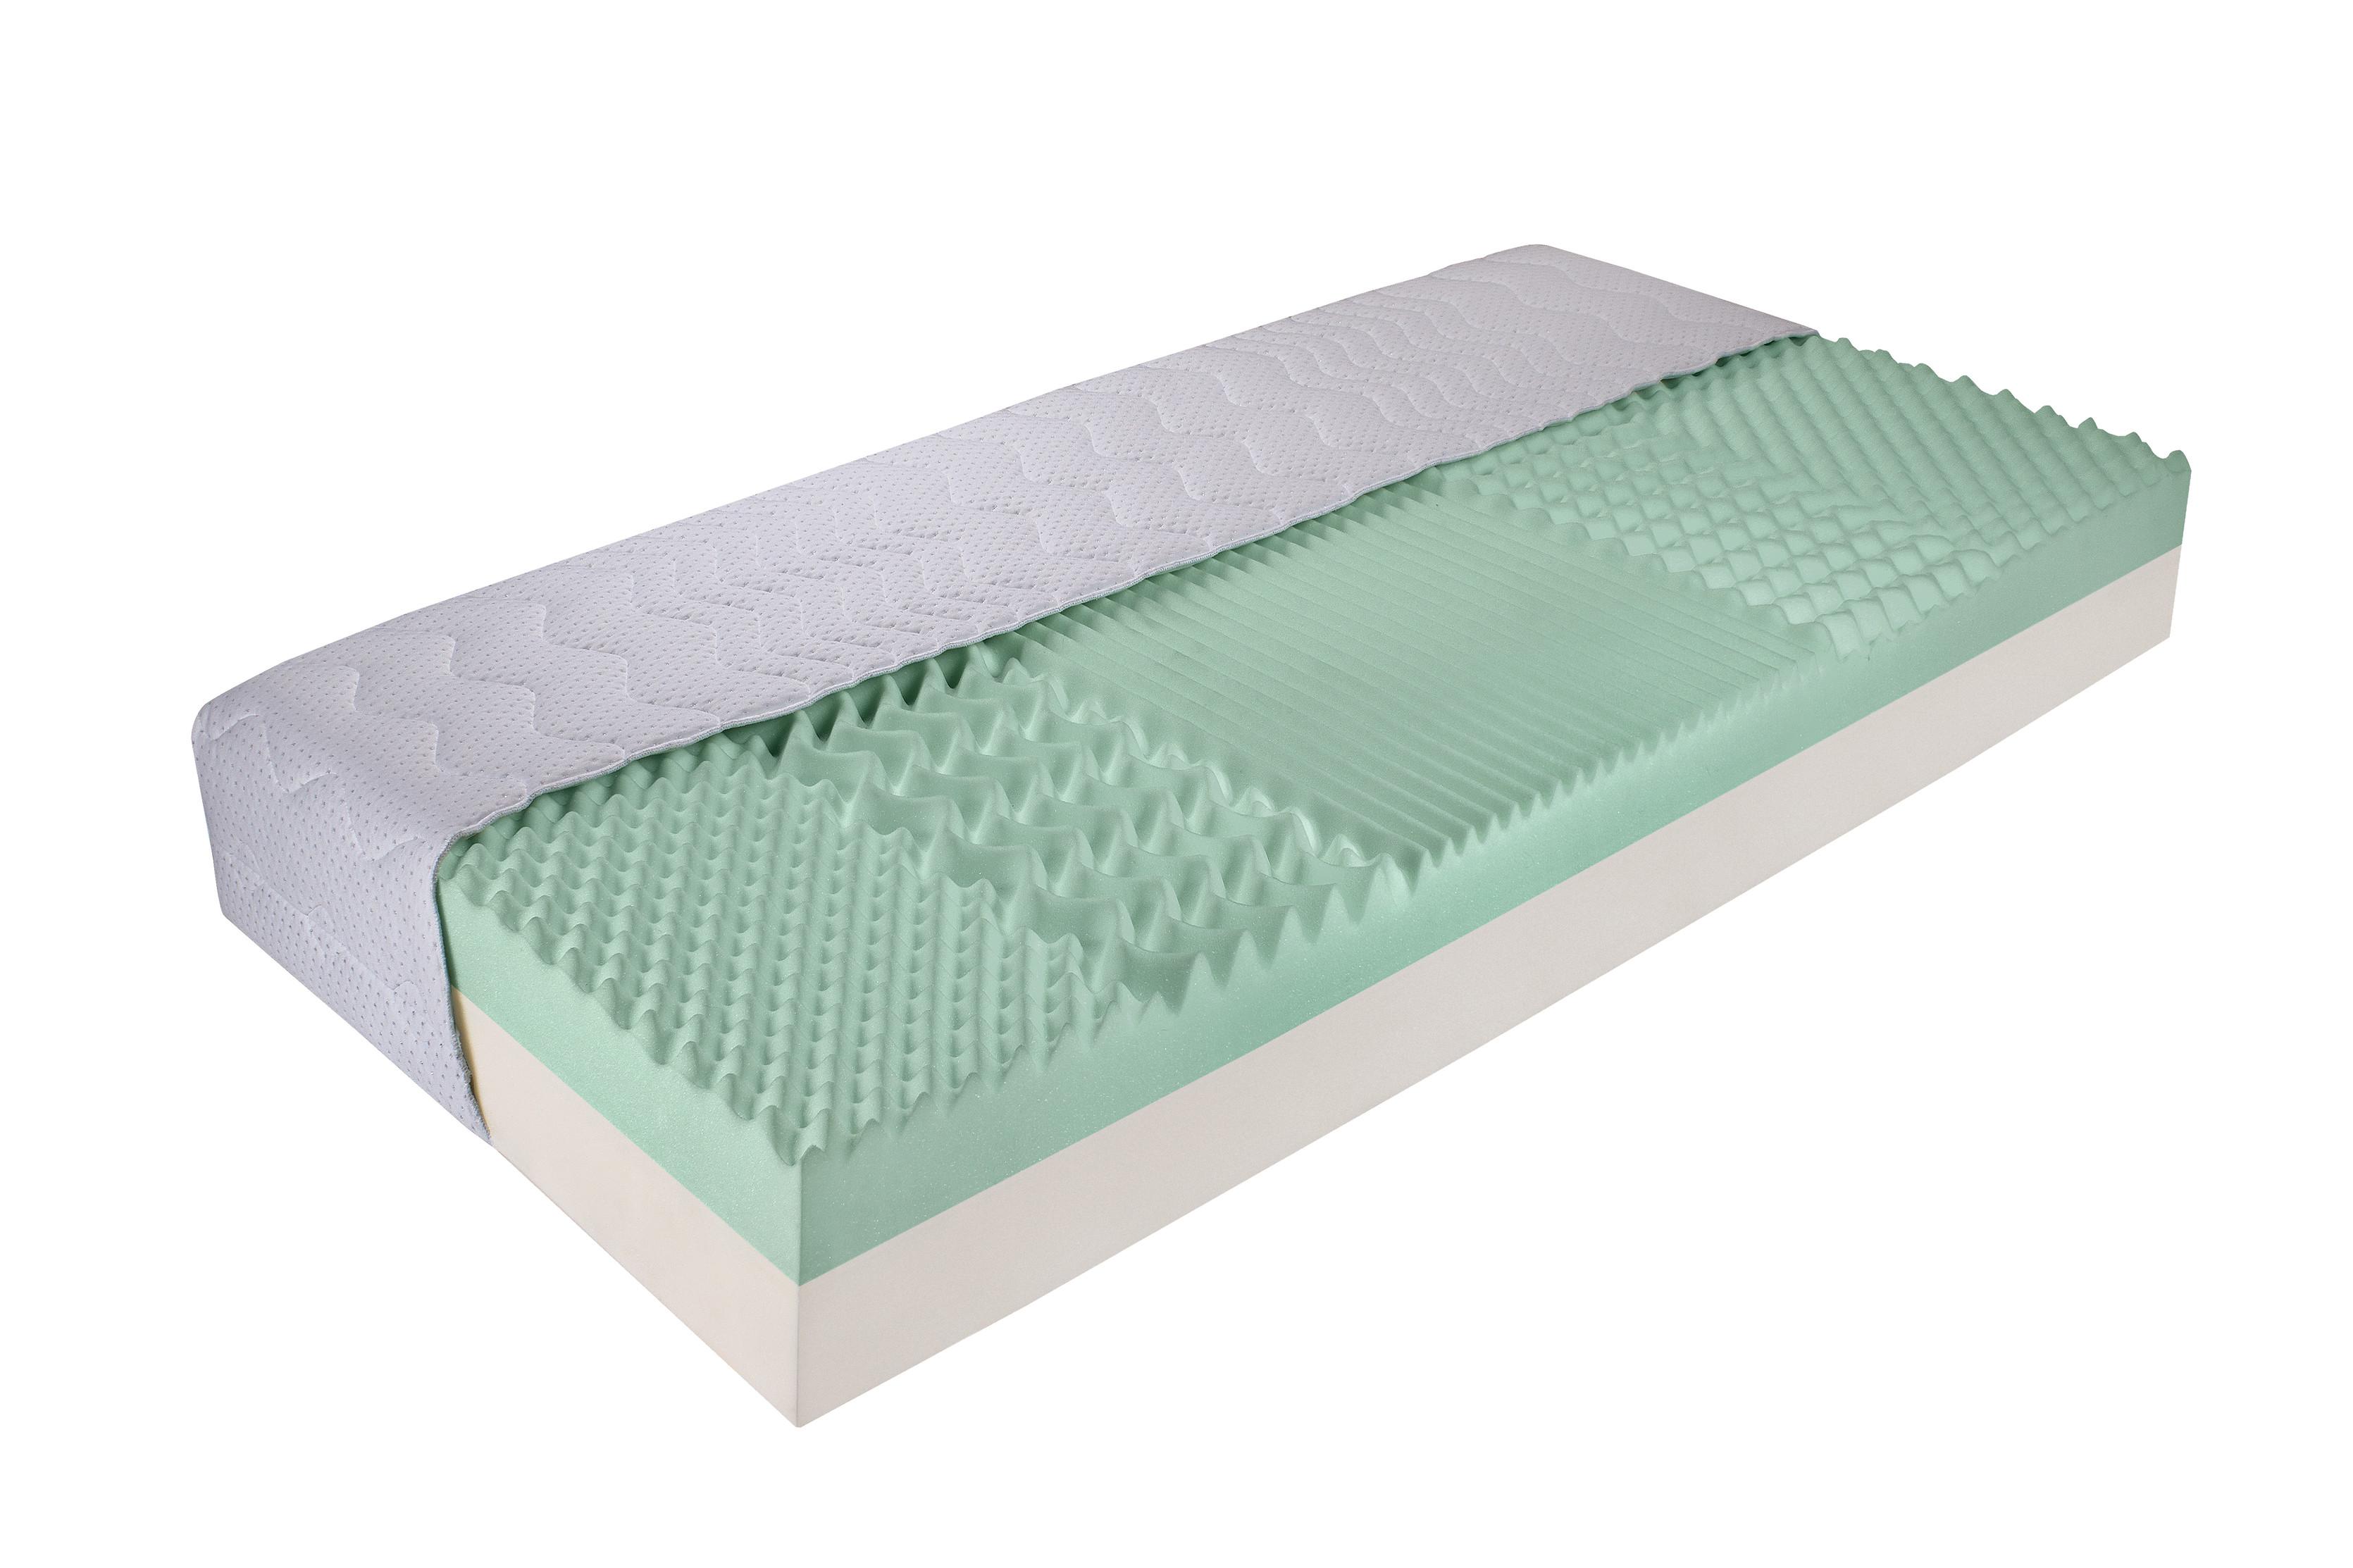 Pěnová matrace - BRW - Lavinia - 200x80 cm (T2/T3)